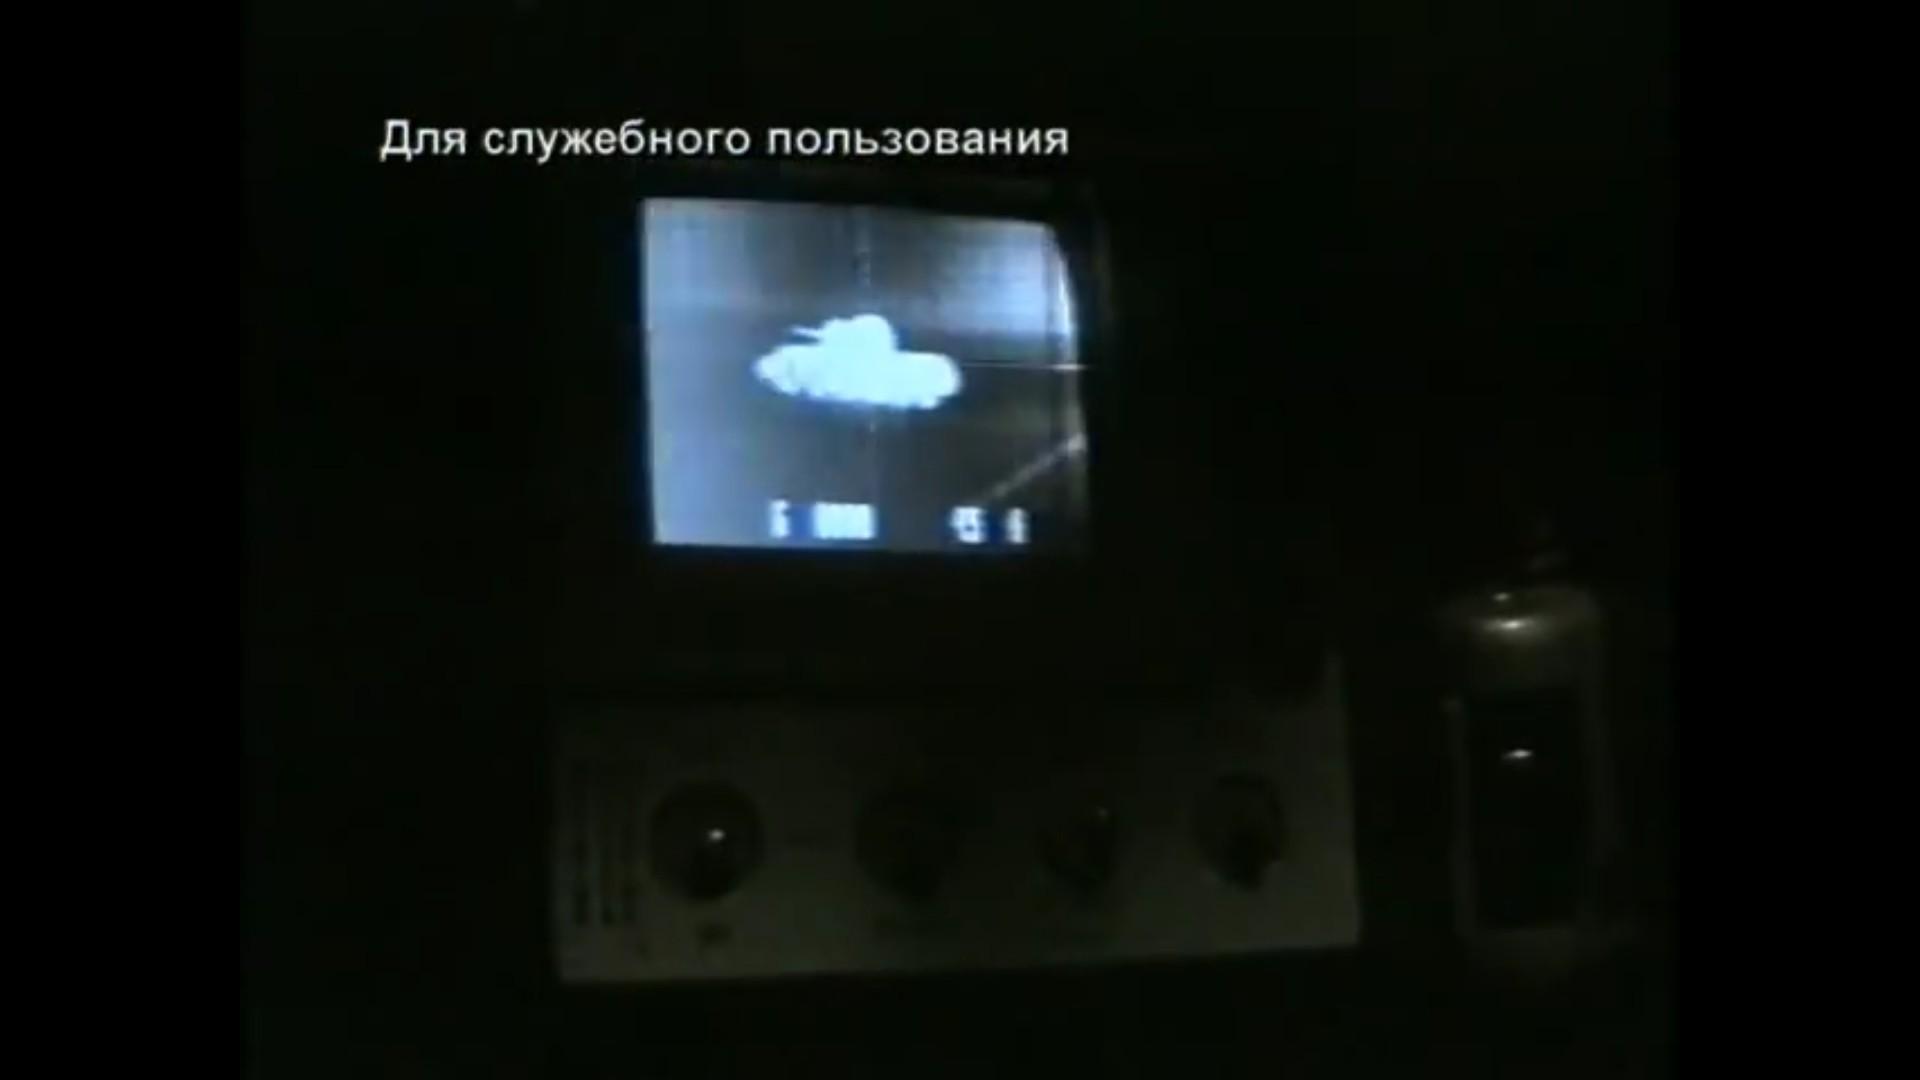 http://s3.uploads.ru/zADG4.jpg